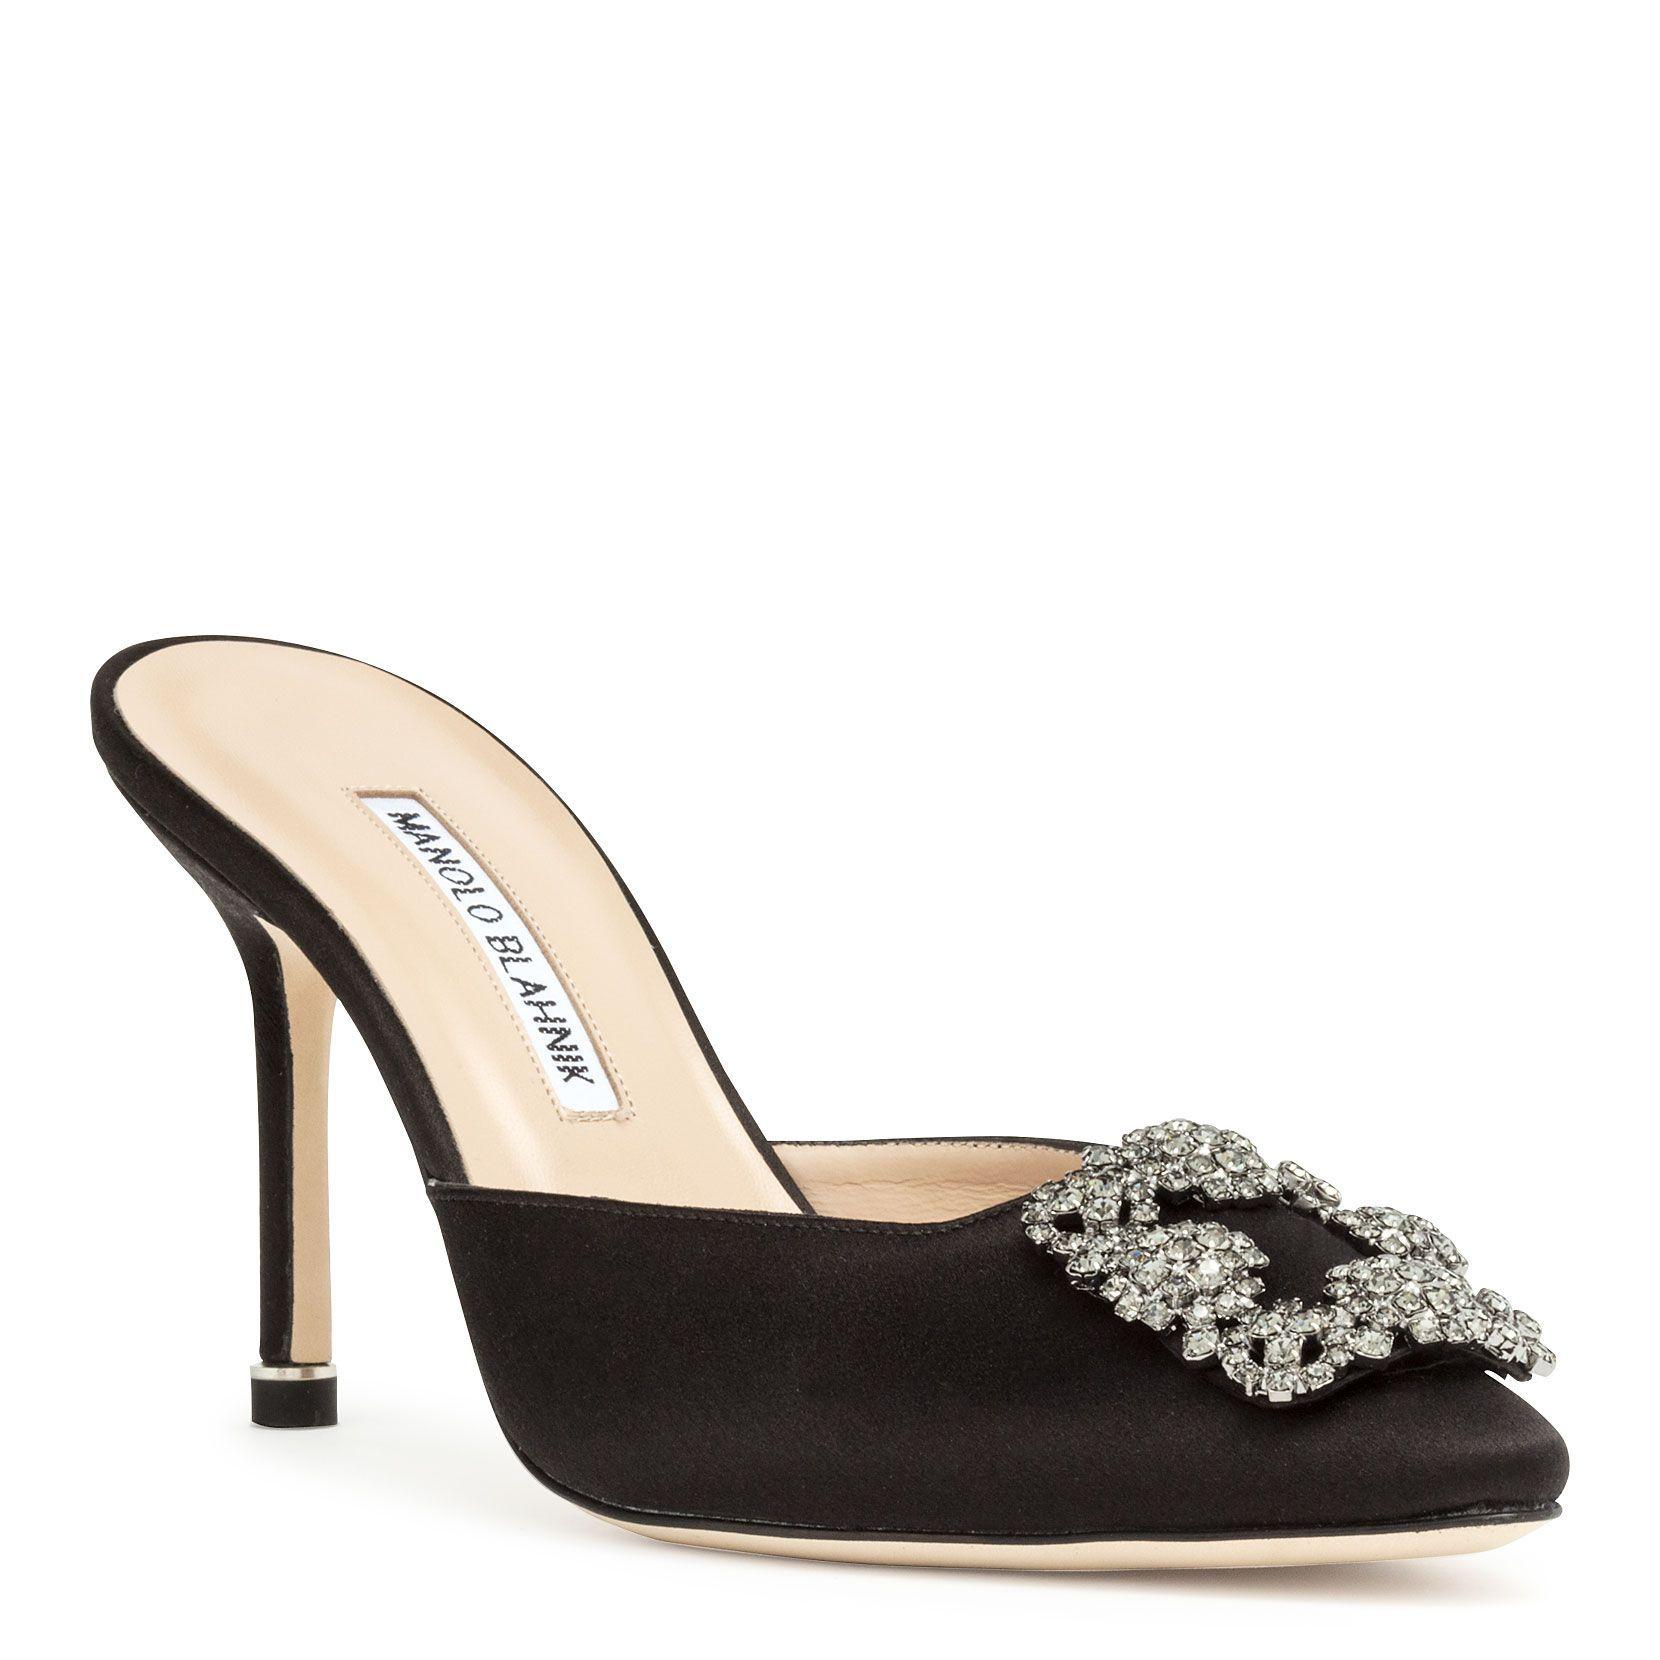 Manolo Blahnik Hangisimu 90 Black Satin Mules Manoloblahnik Shoes Manoloblahnikheels Manolo Blahnik Manolo Blahnik Heels Blahnik